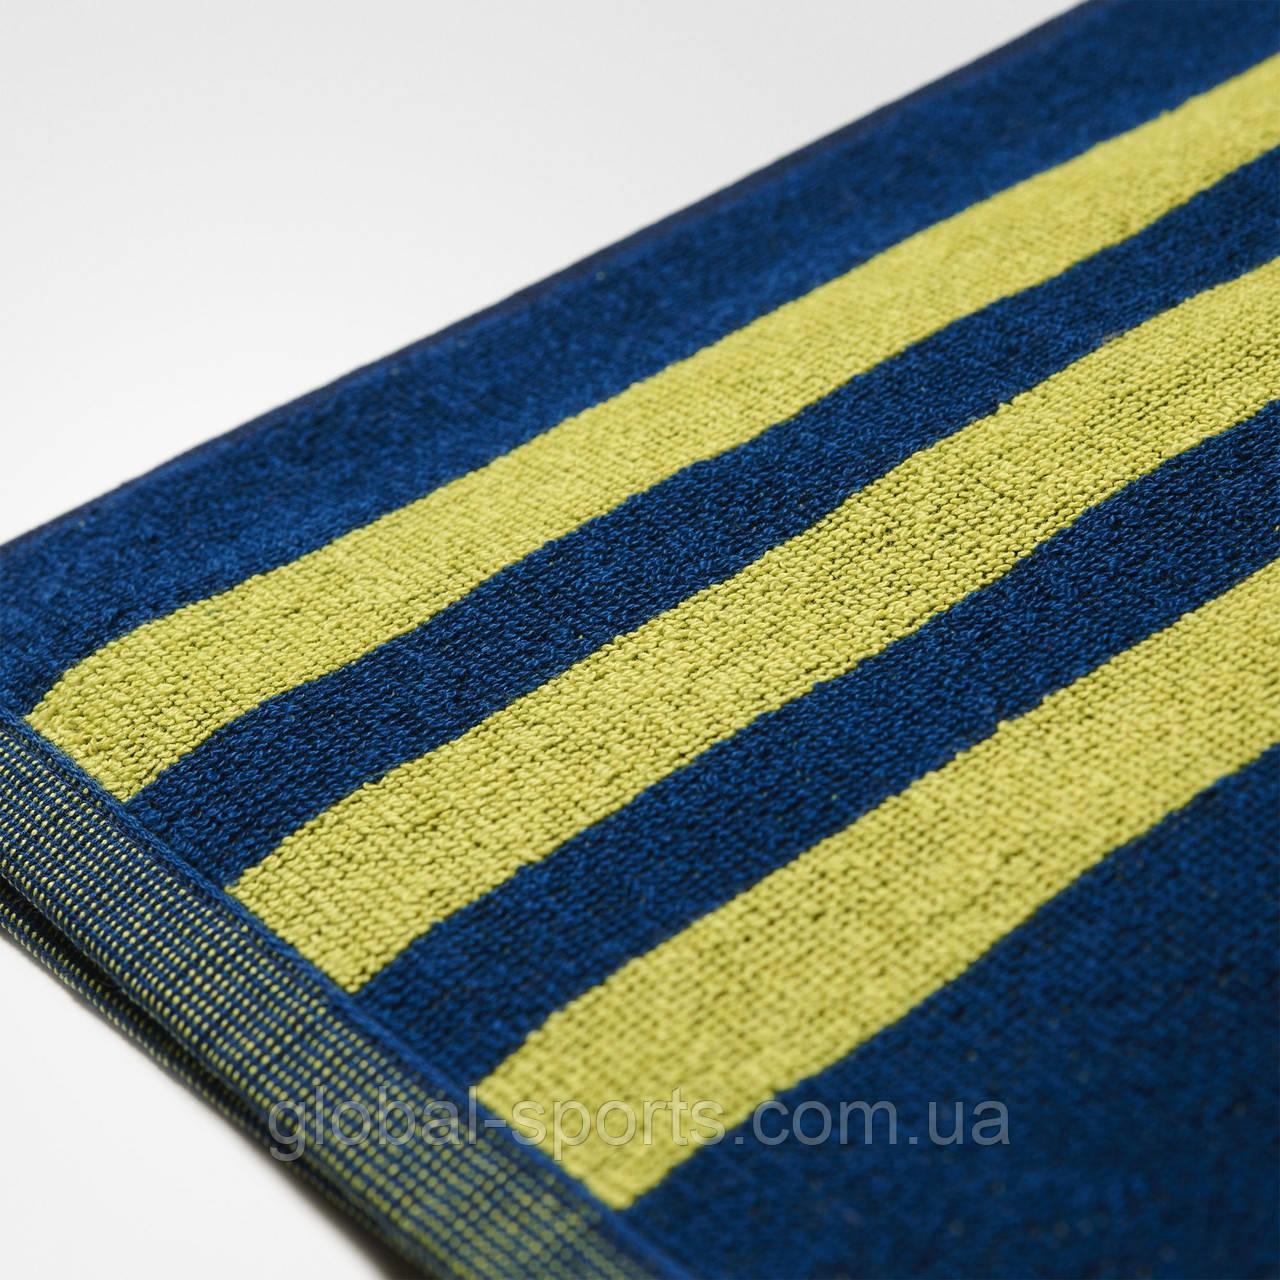 bb7ba6b9e29693 Полотенце ADIDAS TOWEL L (Артикул: AY2796): продажа, цена в Харькове ...